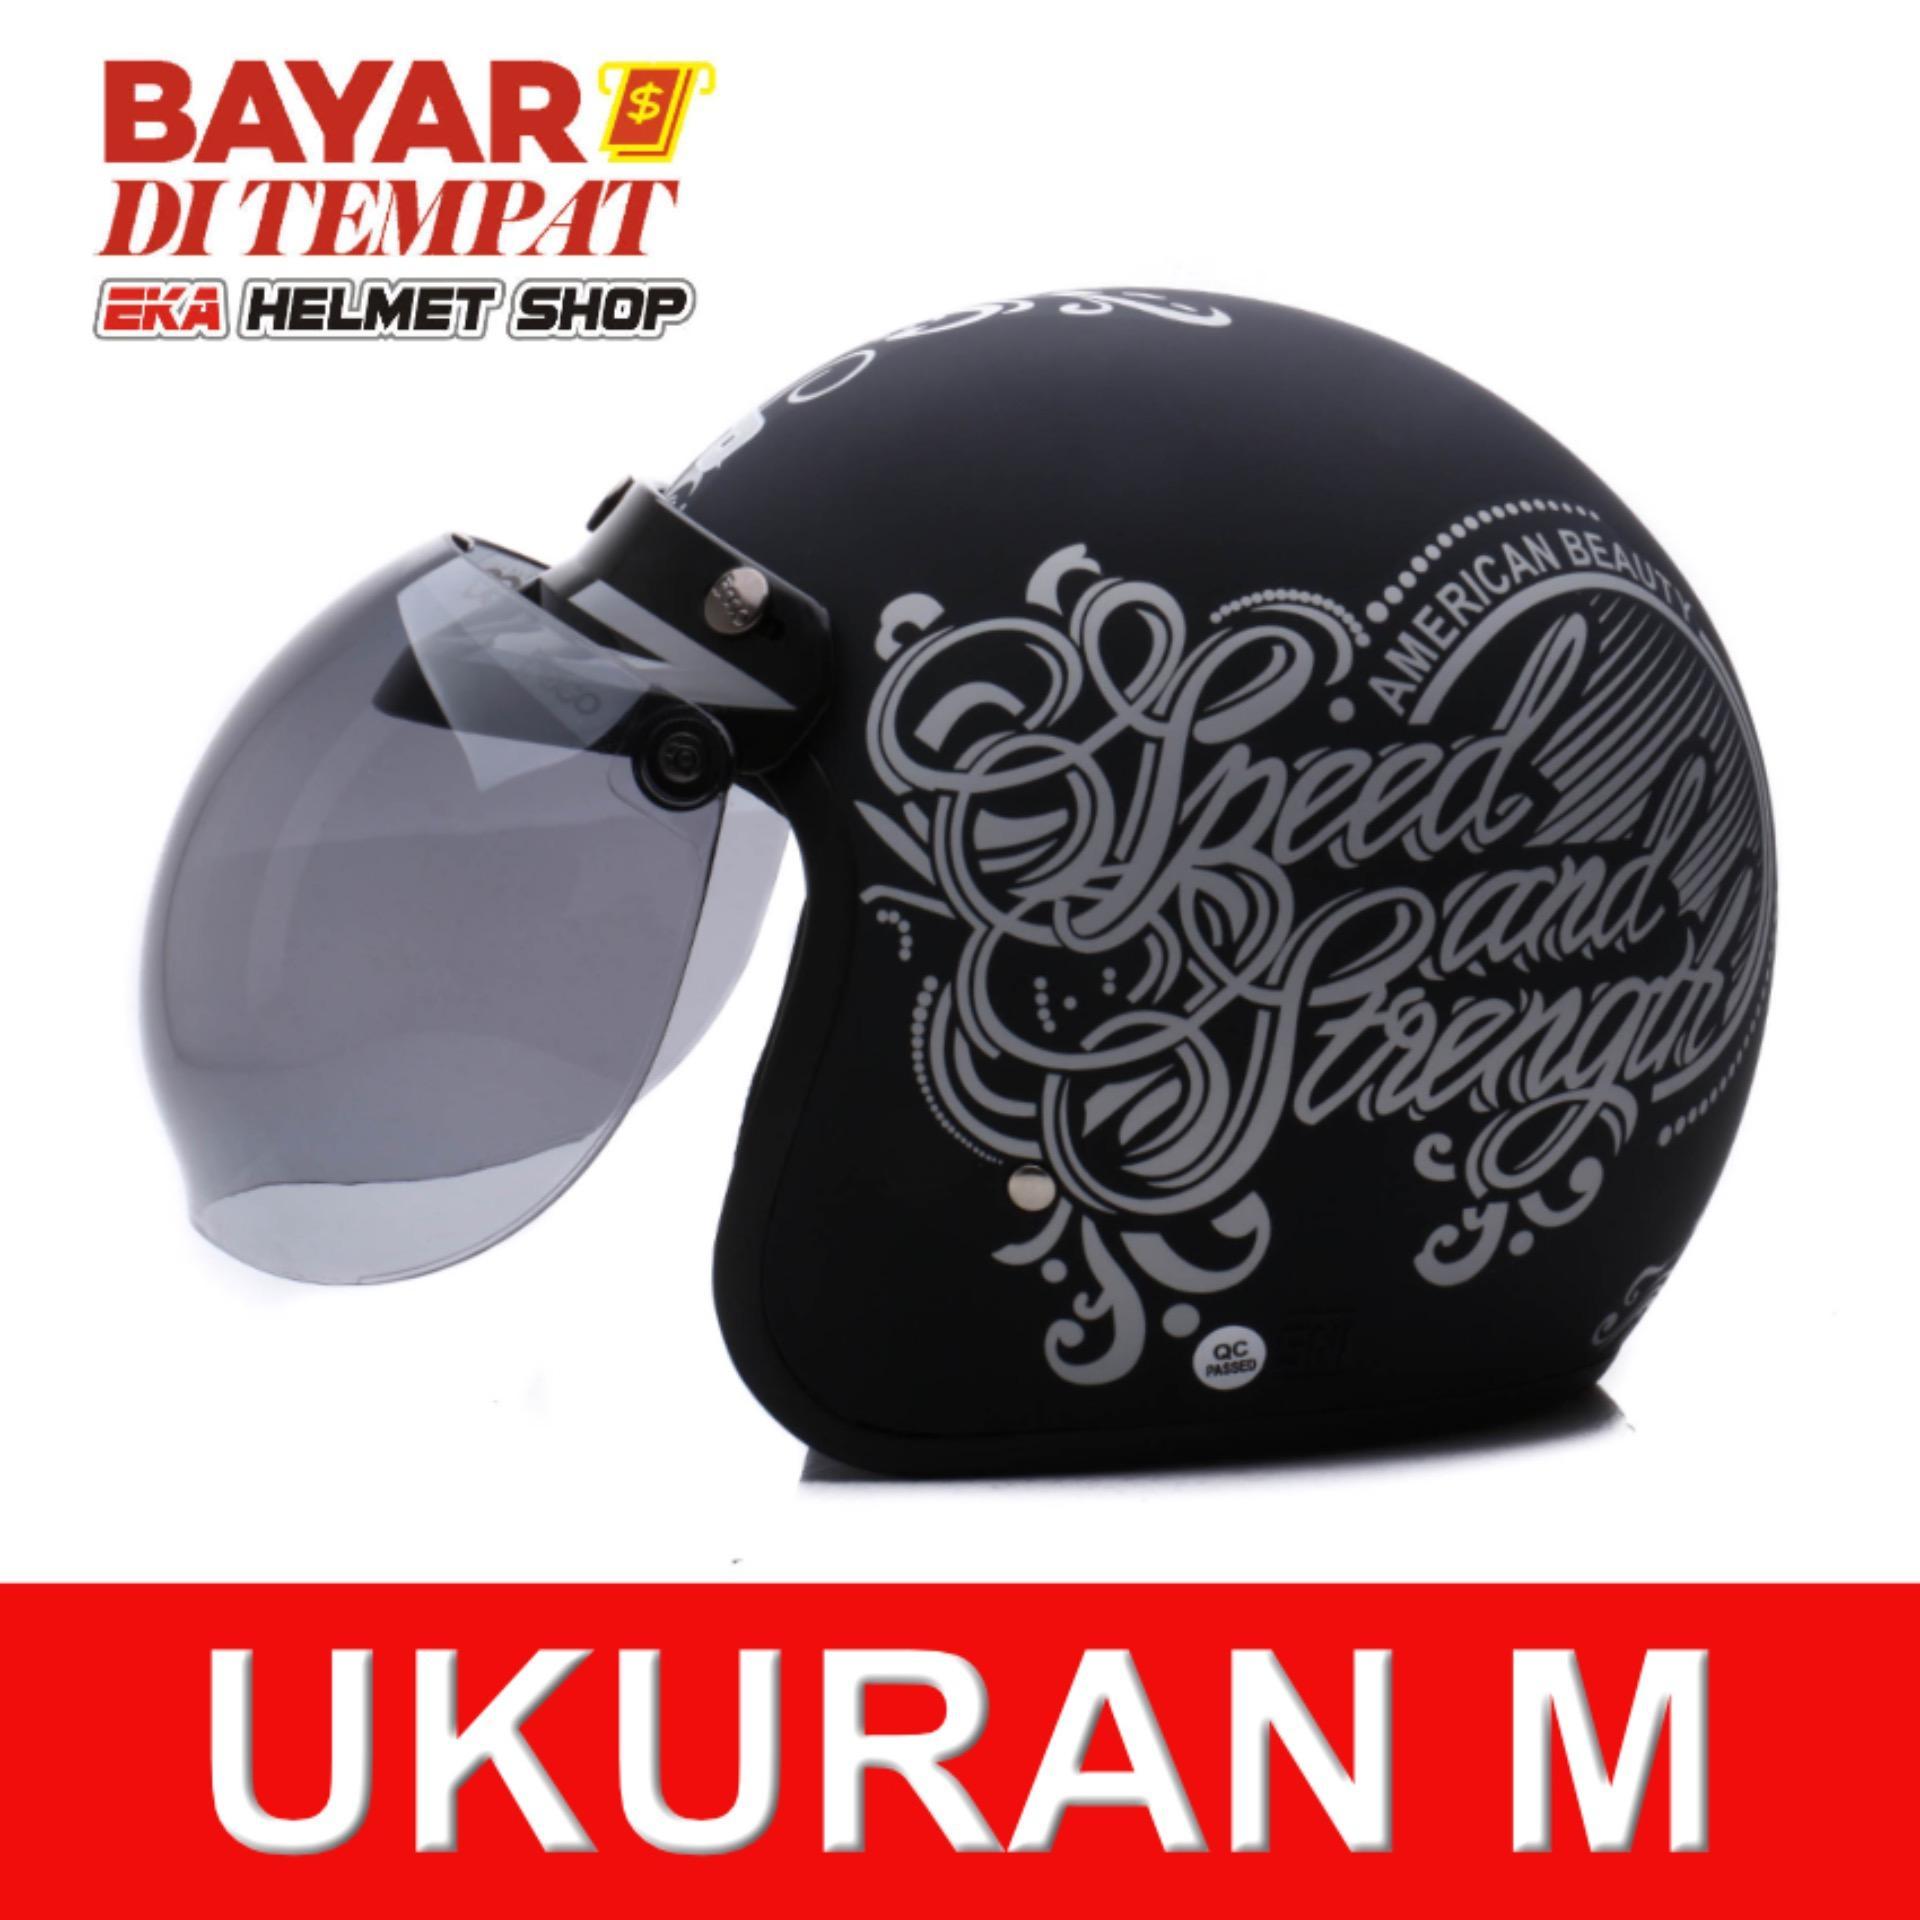 Jual Wto Helmet Retro Bogo Strength Hitam Doff Perak Wto Helmet Grosir